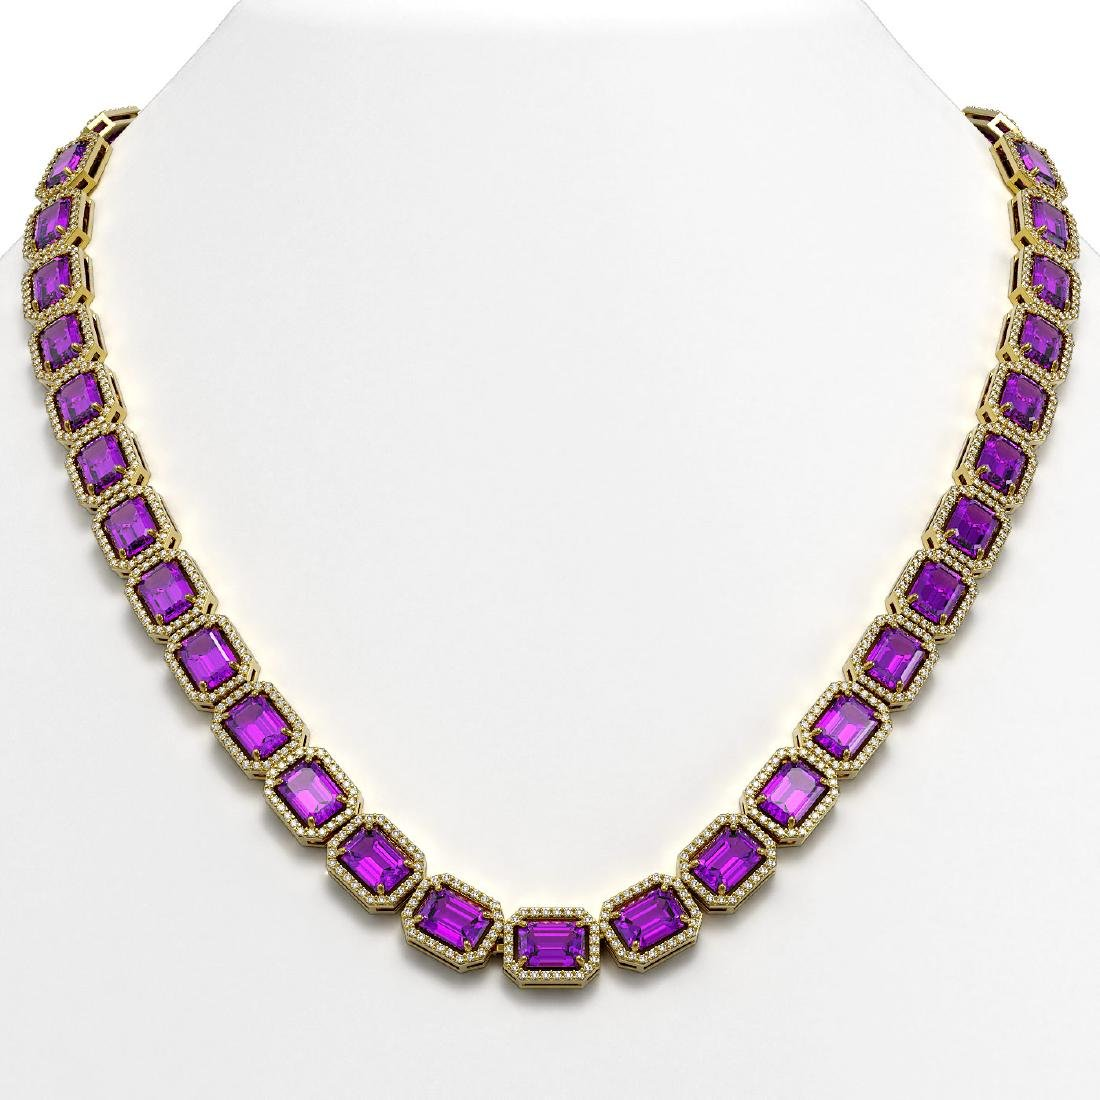 50.99 CTW Amethyst & Diamond Halo Necklace 10K Yellow